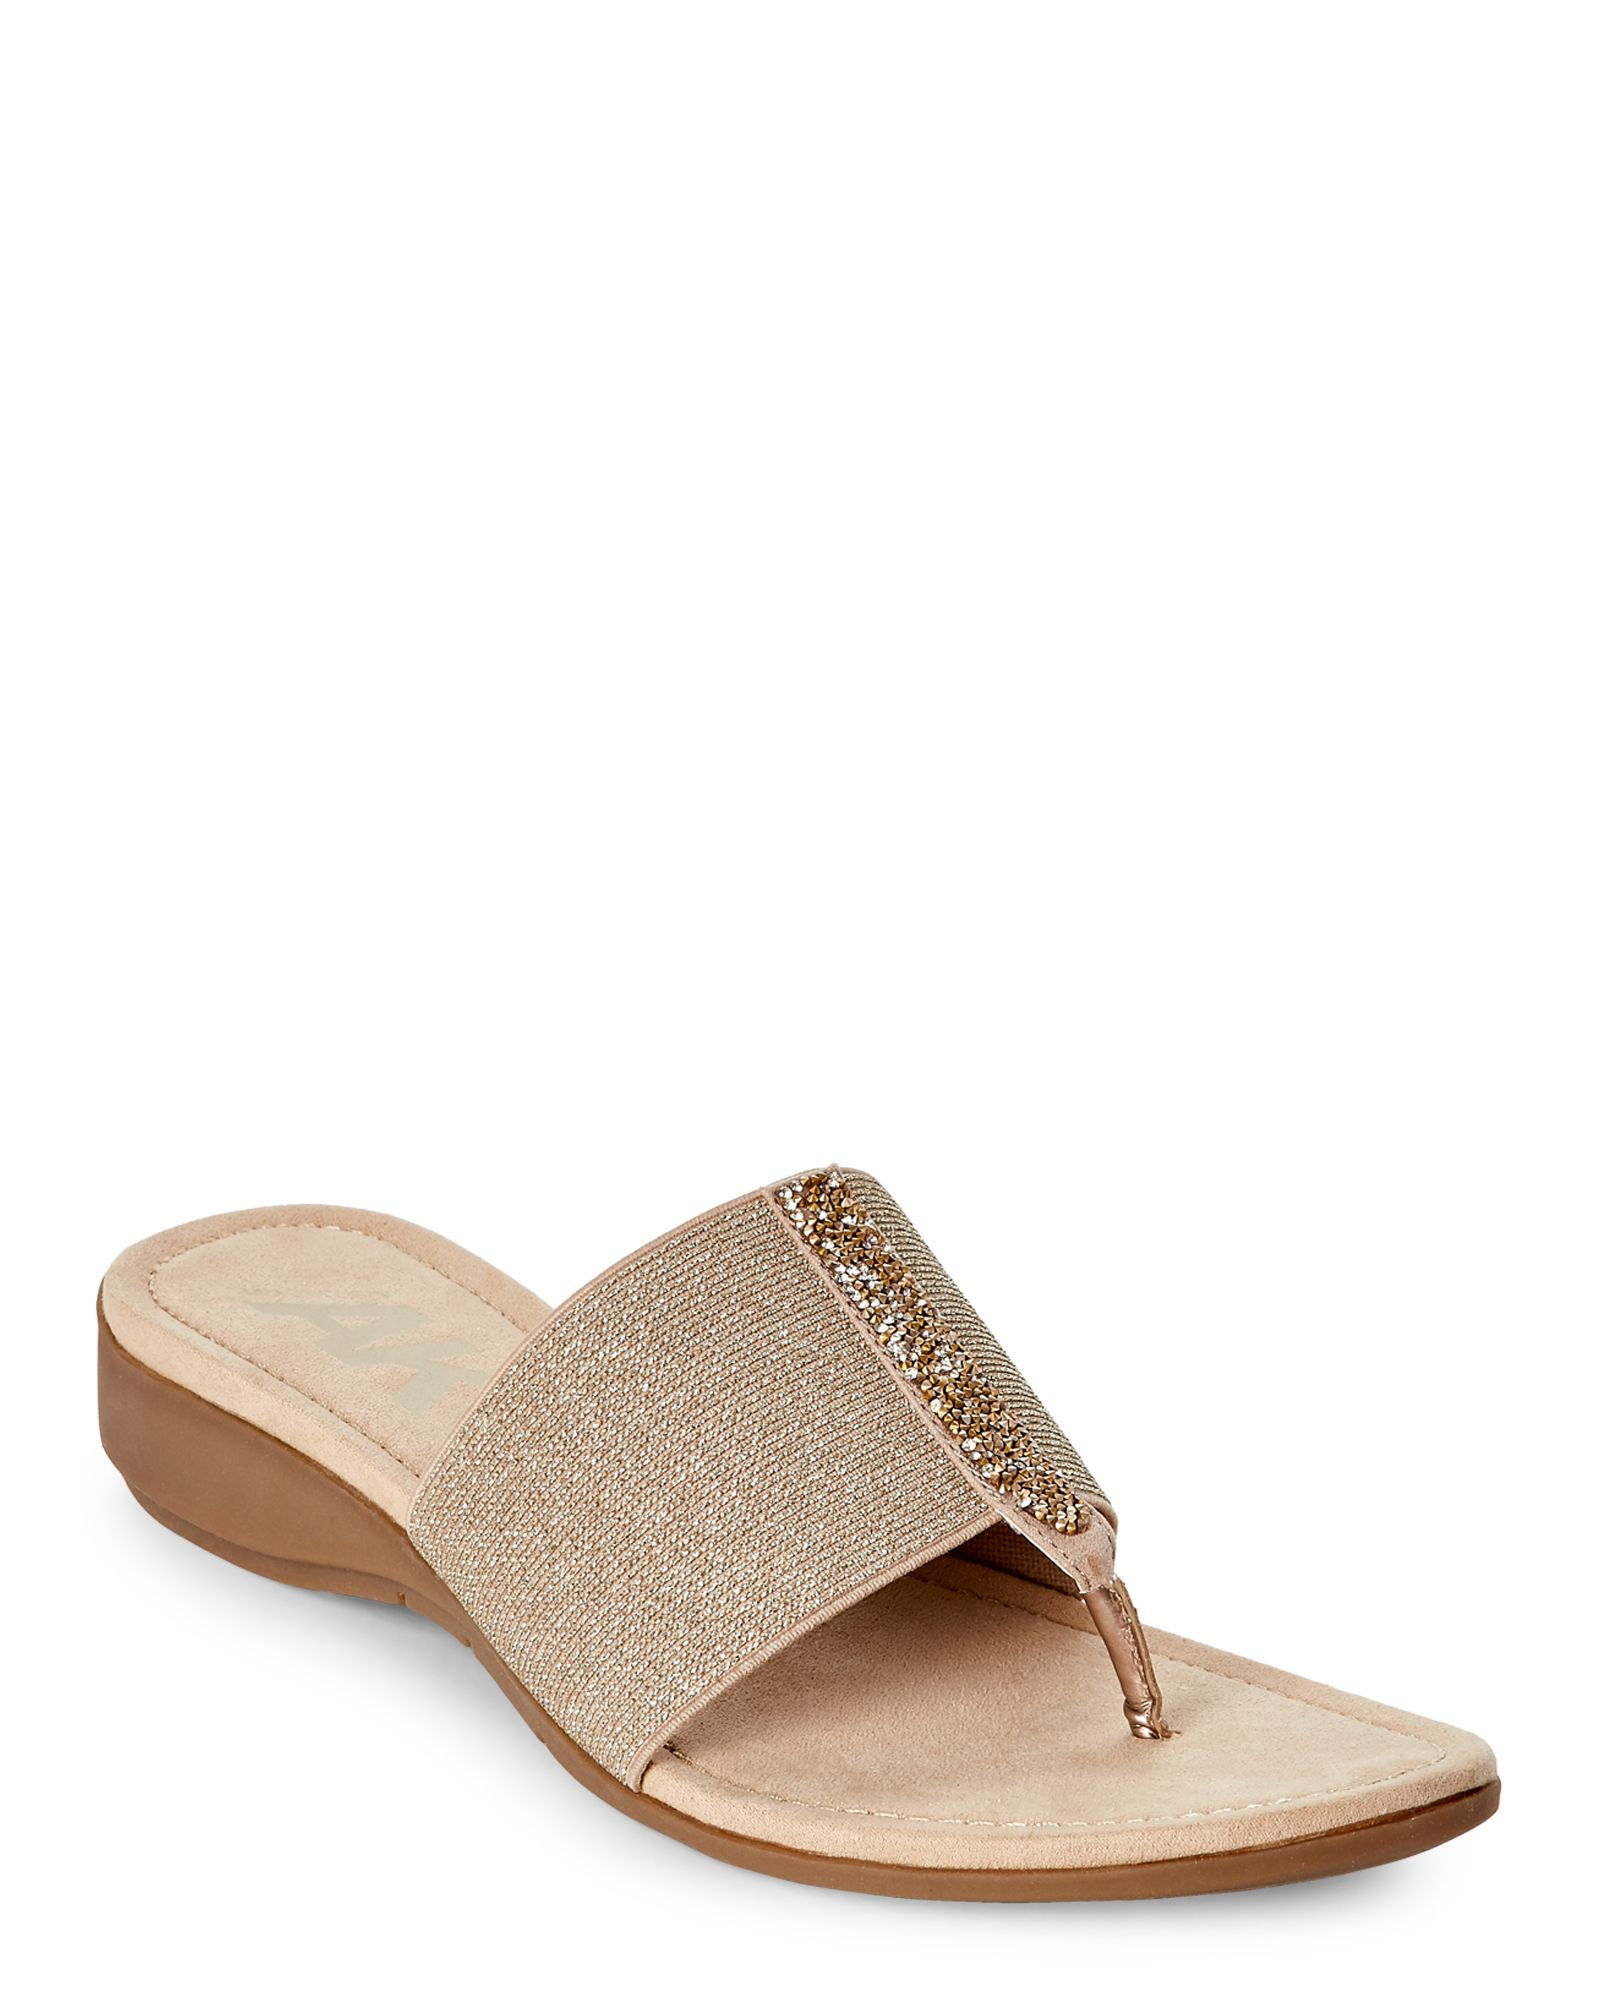 848dc3ecd9a4 Ak Anne Klein Sport Light Pink Kevian Demi Wedge Thong Sandals ...